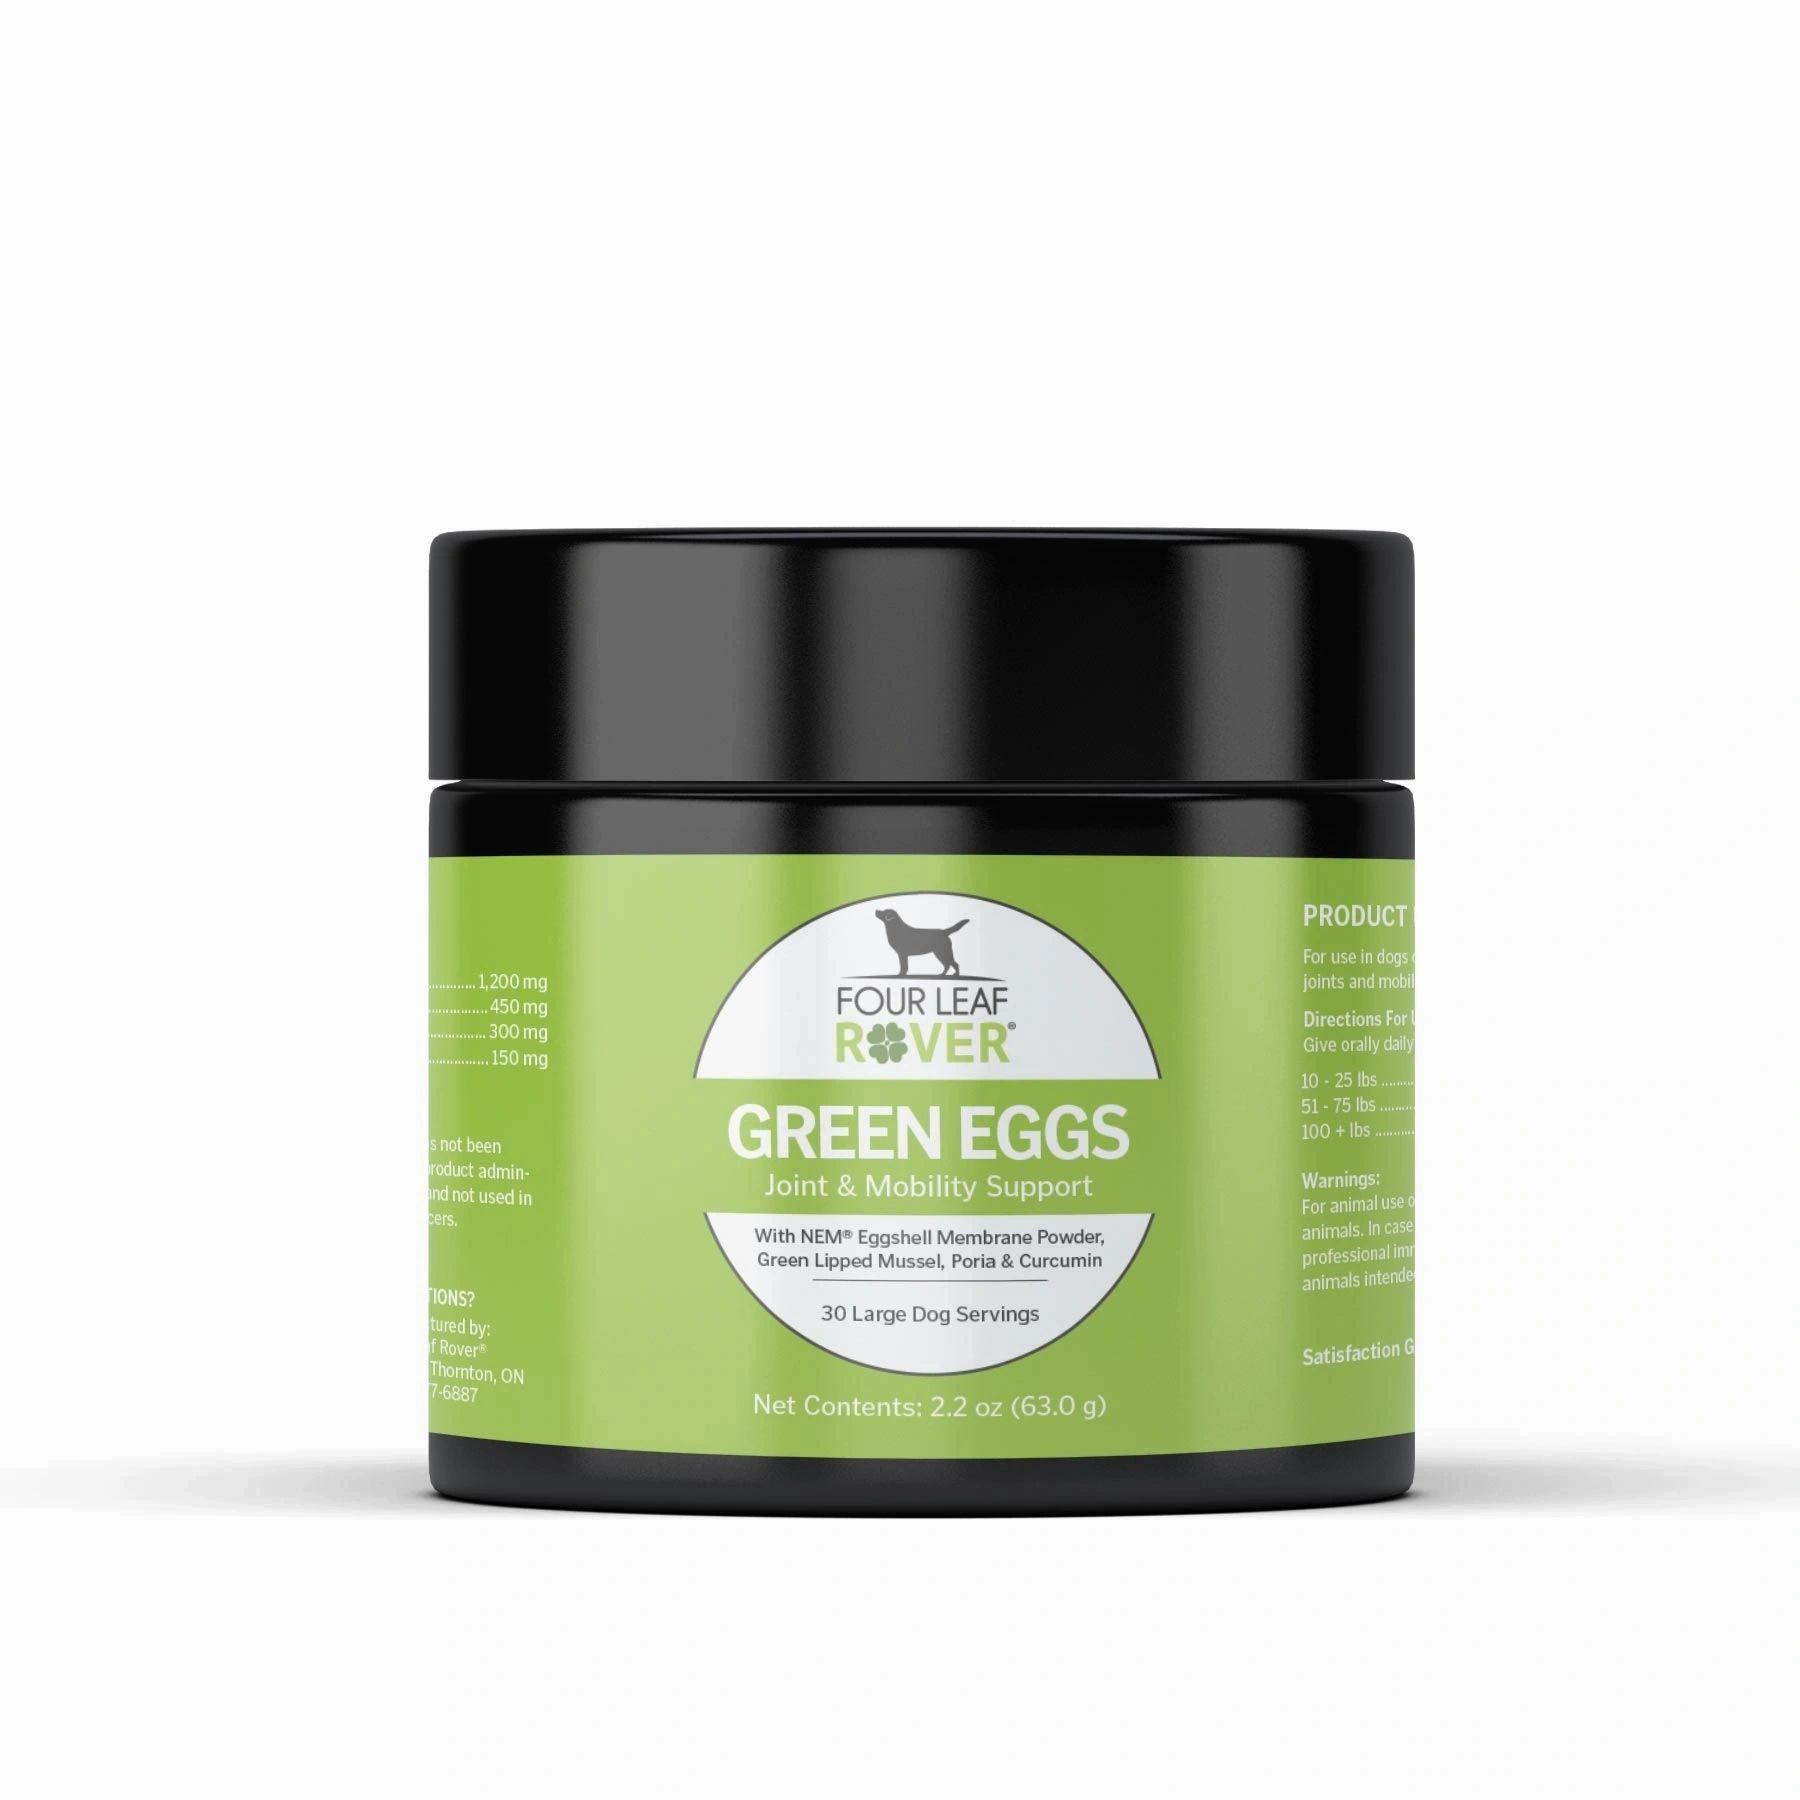 Four Leaf Rover Green Eggs